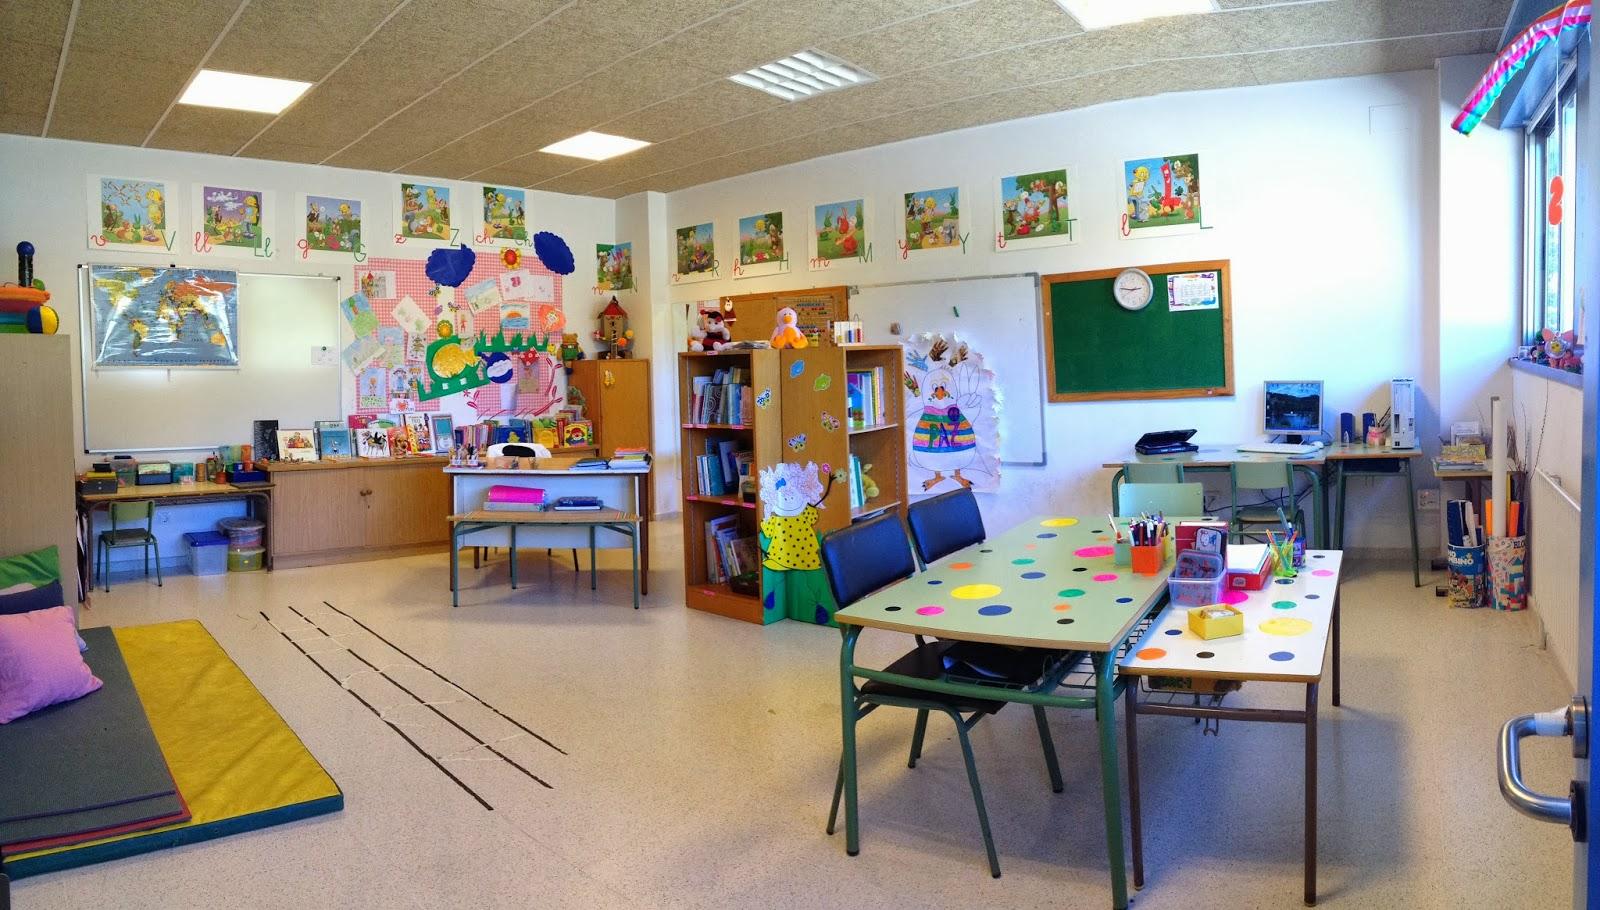 El salon de clases - 1 part 3